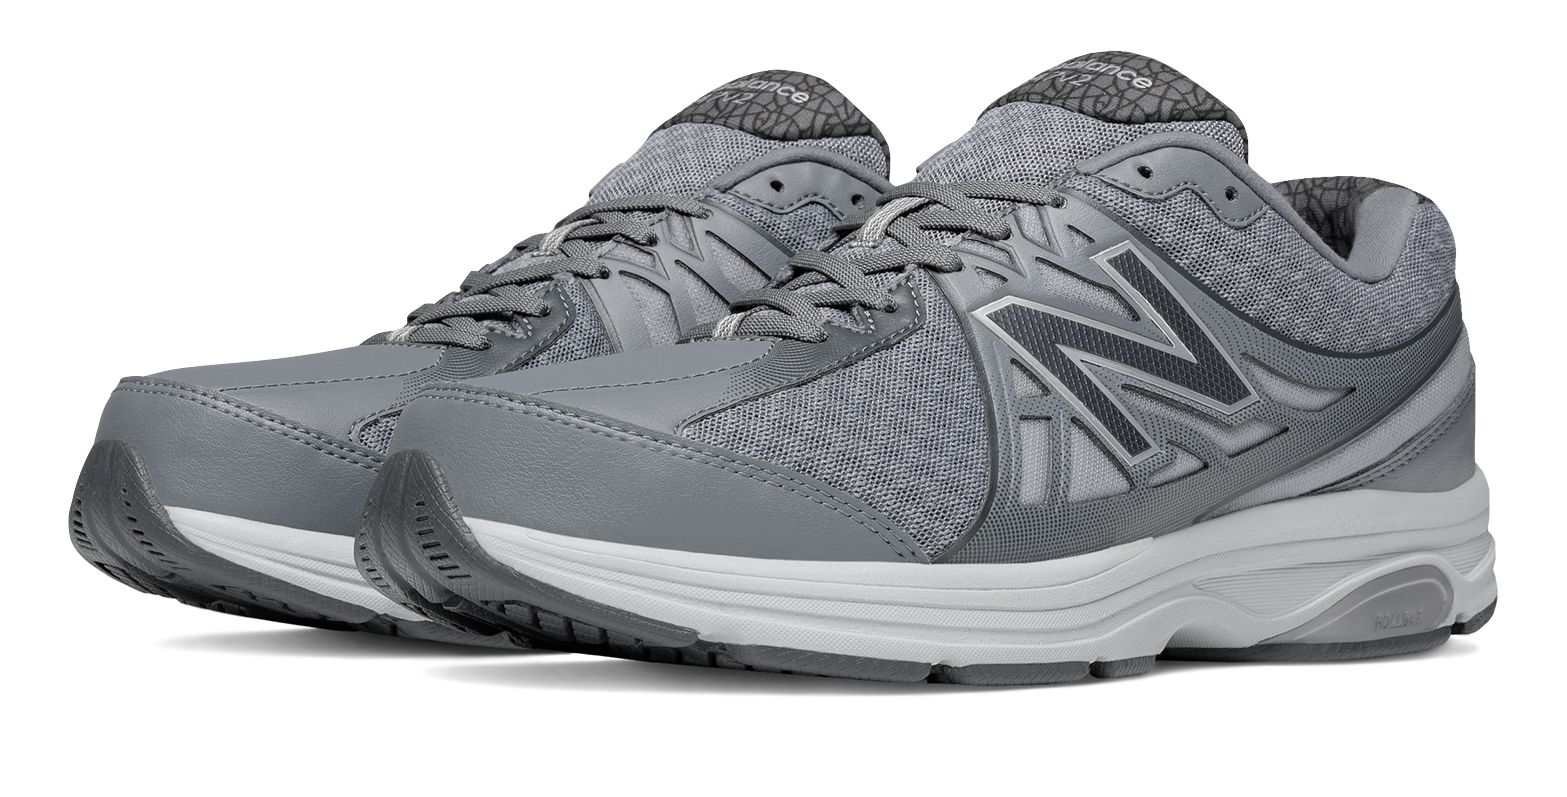 Discount Men\u0027s New Balance Walking Shoes | Joe\u0027s Official New Balance Outlet